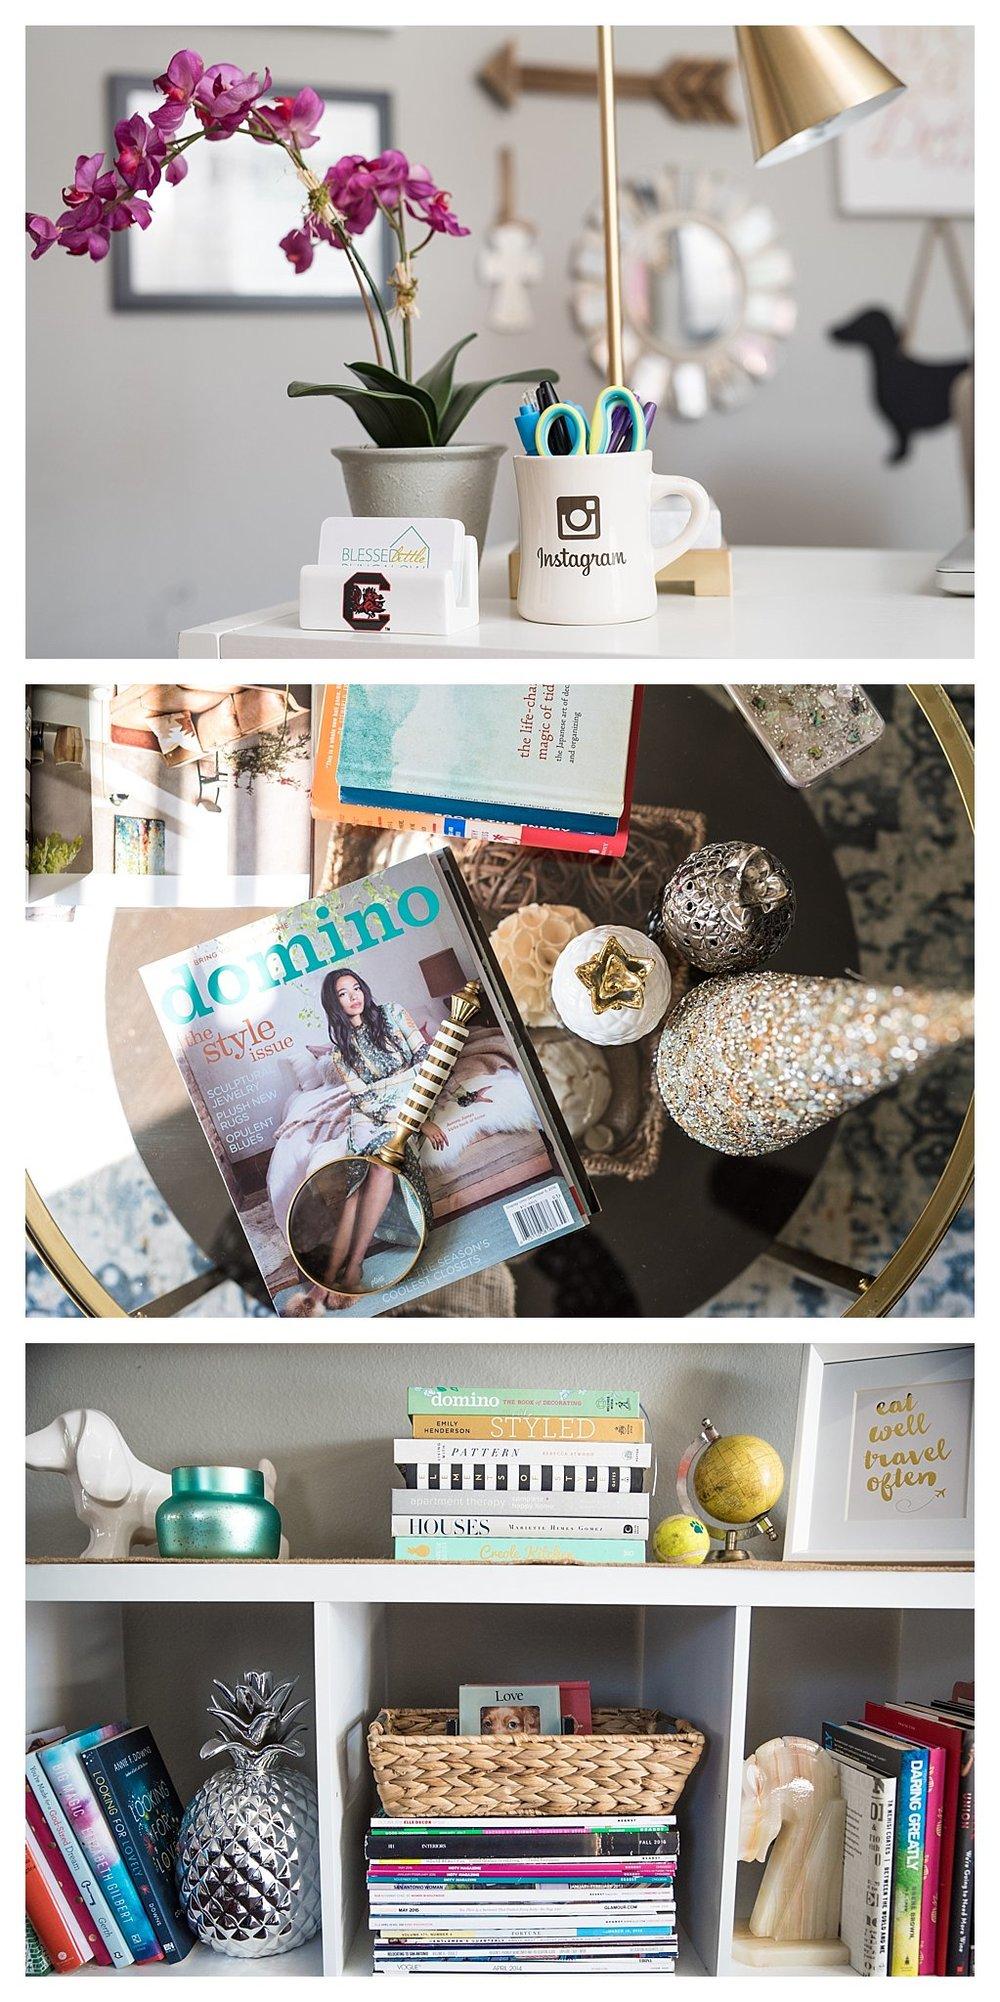 home-decorating-tips-tricks-san-antonio-photographer.jpg